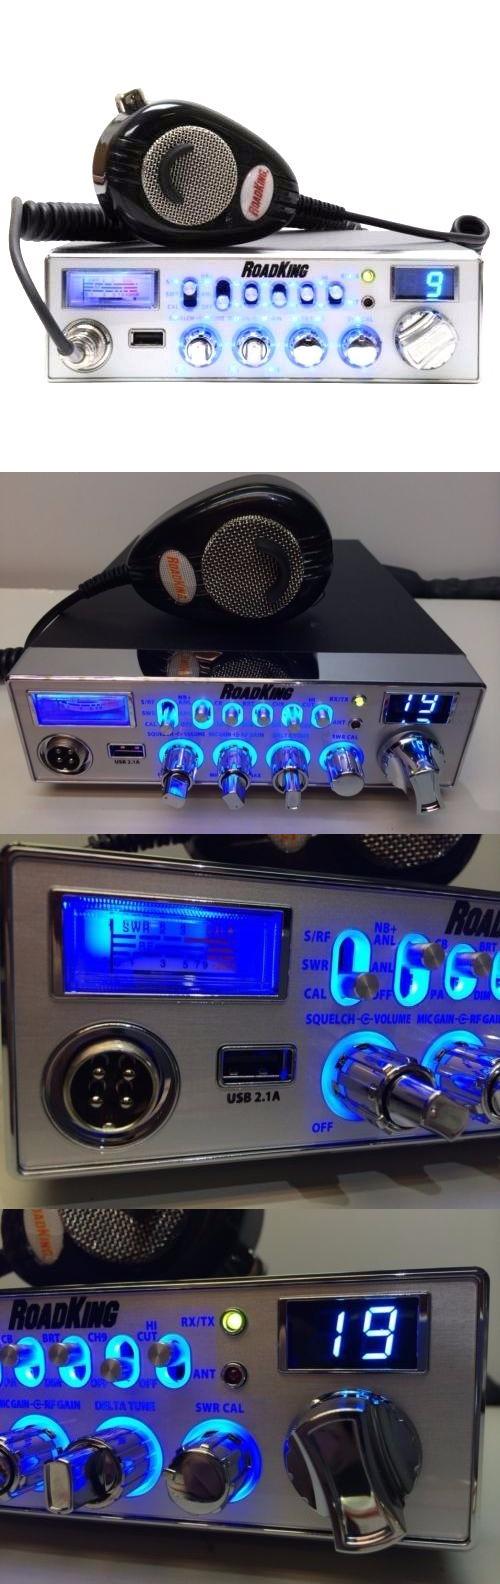 CB Radios: Roadking Cb Radio 40 Channel Turner Rk56 Mic 4Pin Blue